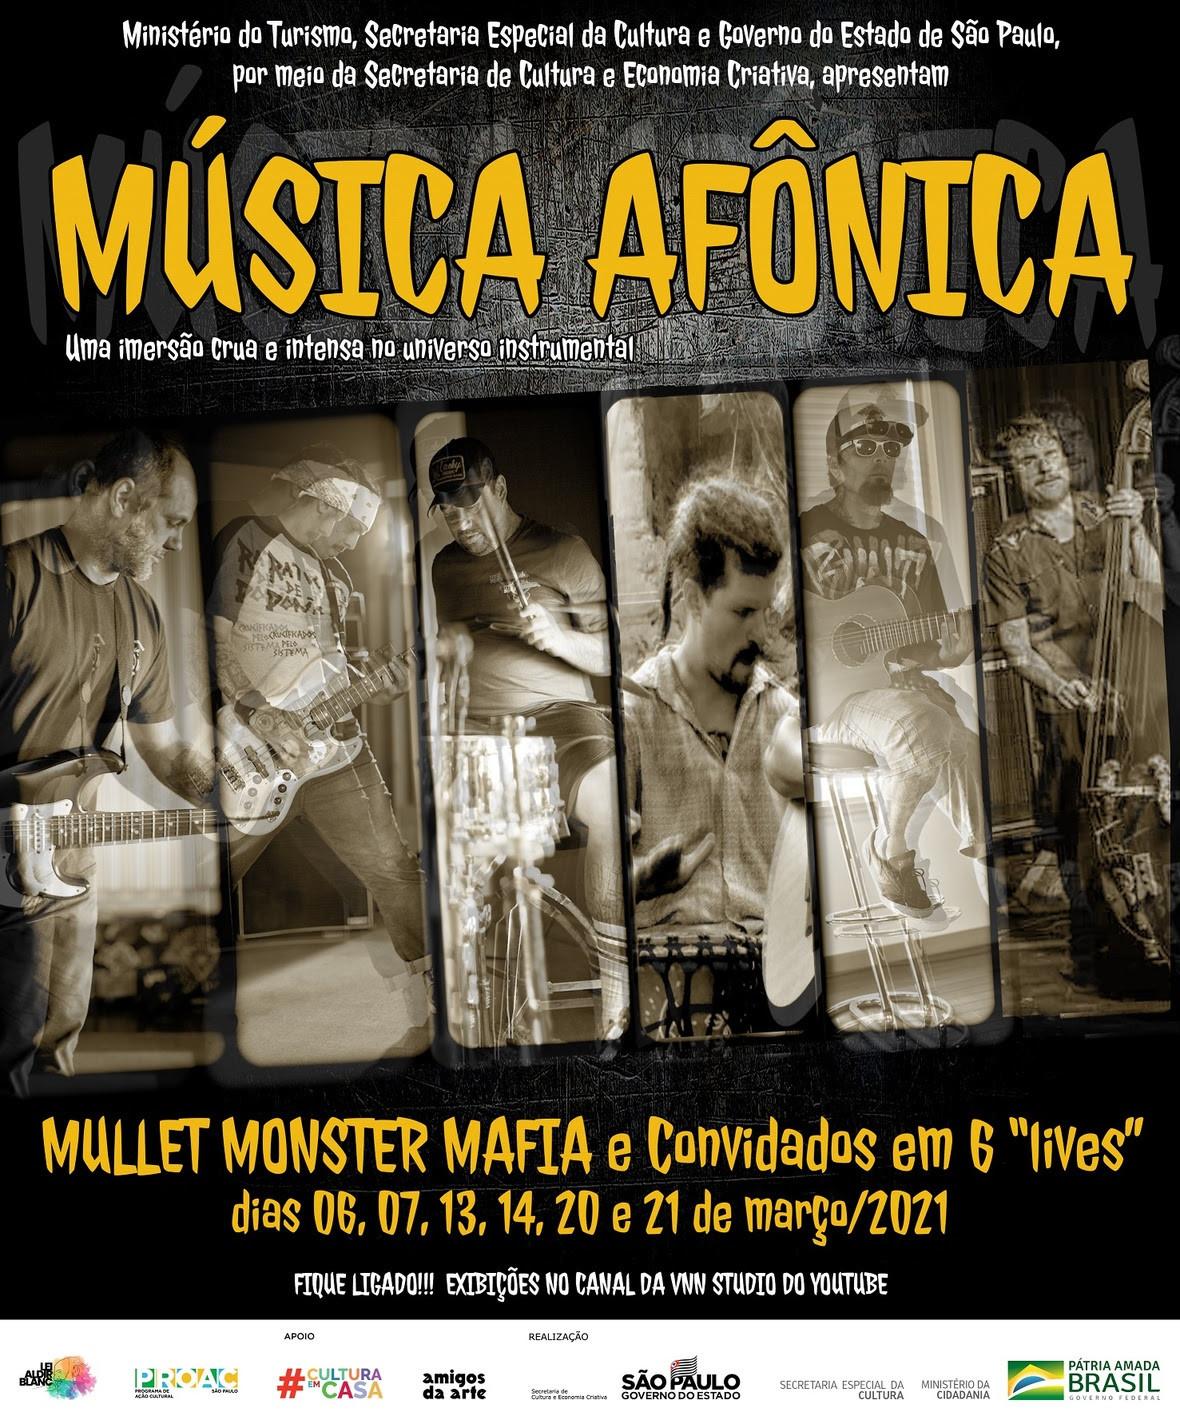 The Mullet Monster Mafia celebra 12 anos com shows online